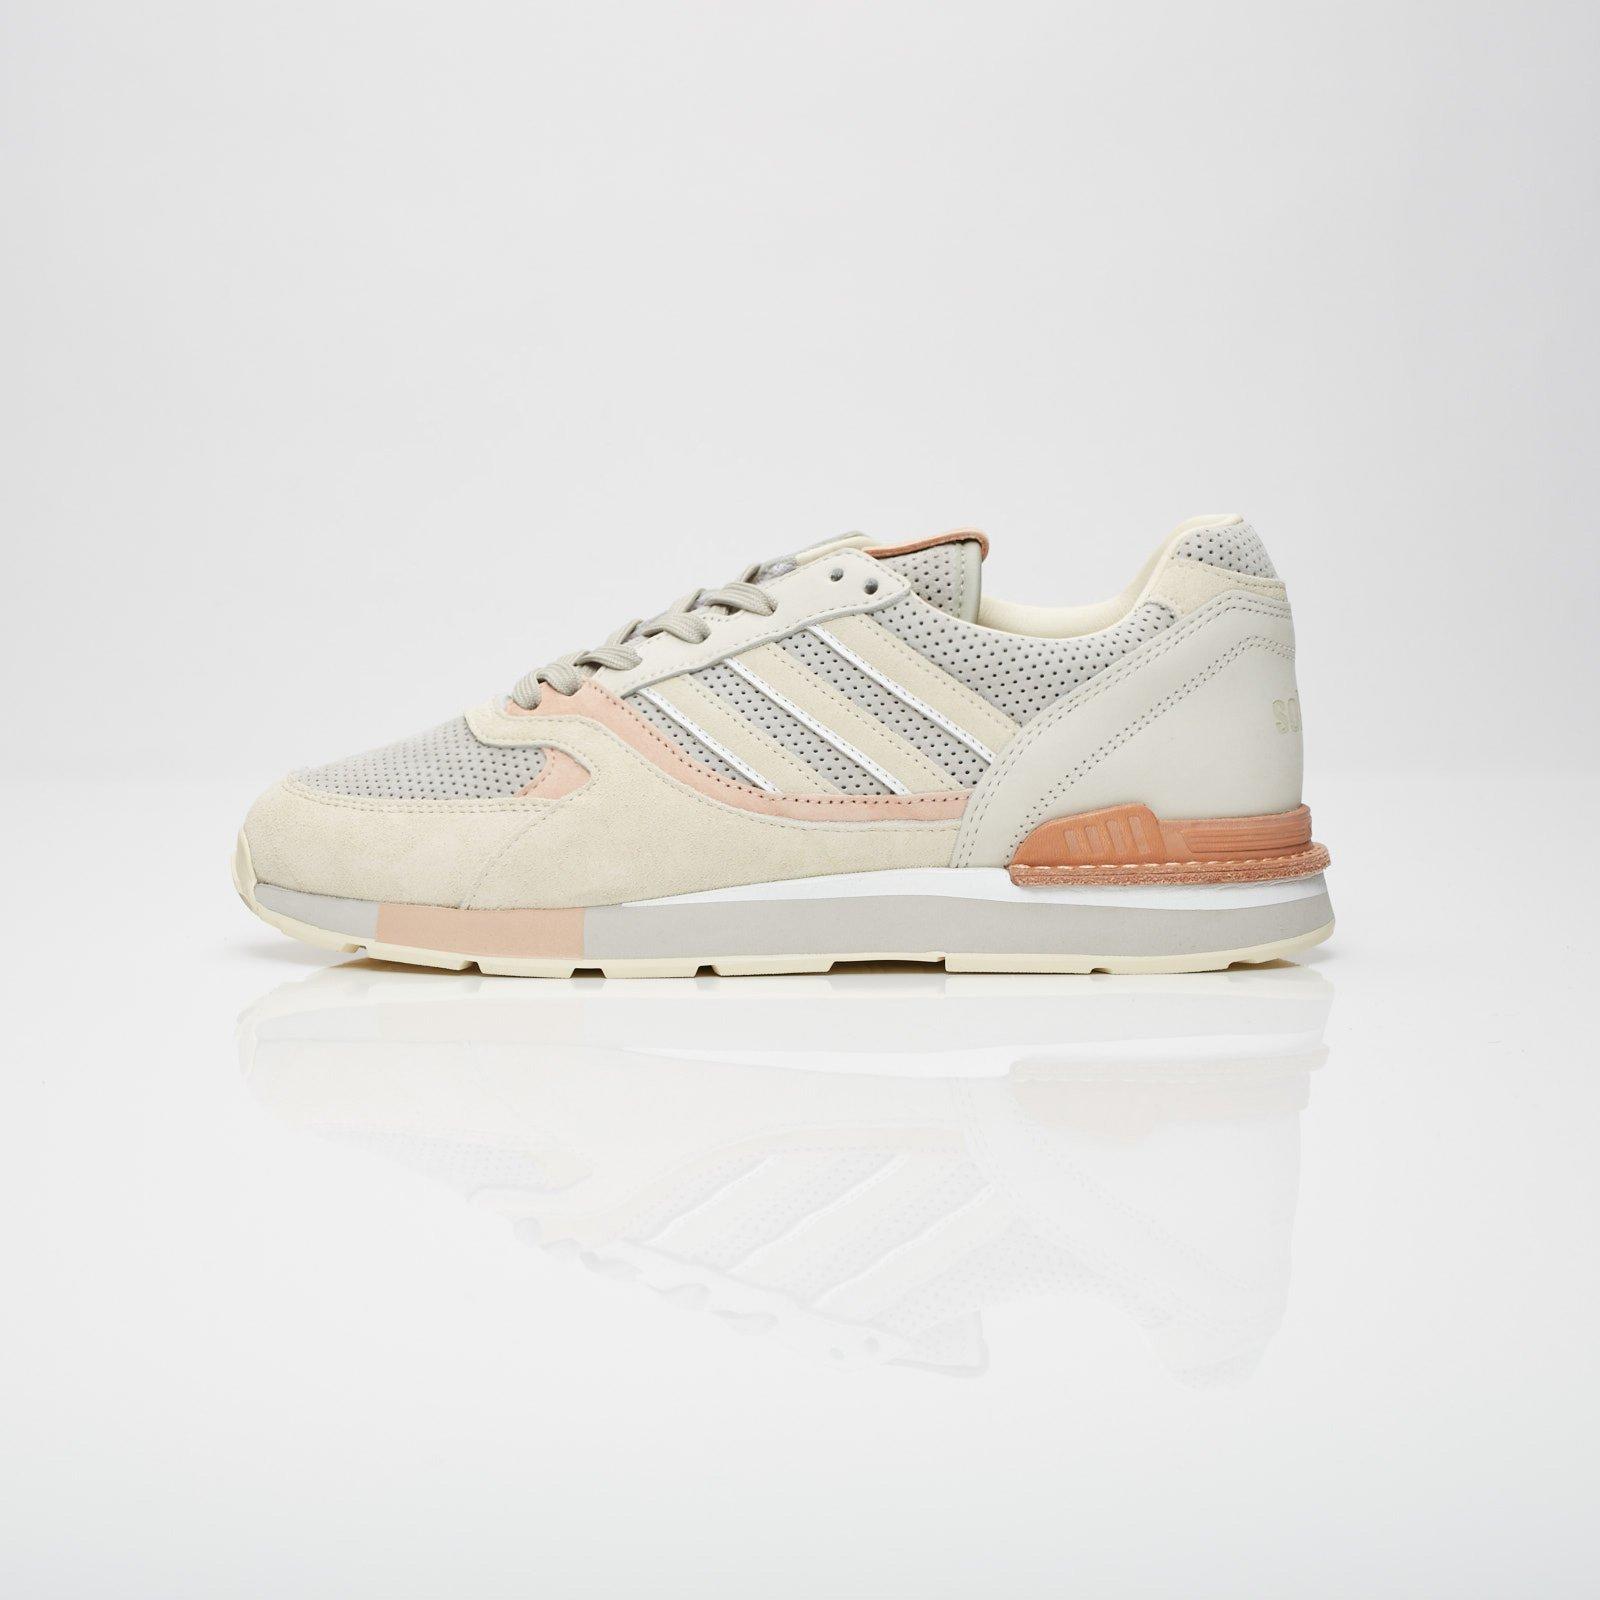 vaso Bloquear Ir al circuito  adidas Quesence x Solebox - Db1785 - Sneakersnstuff | sneakers & streetwear  på nätet sen 1999